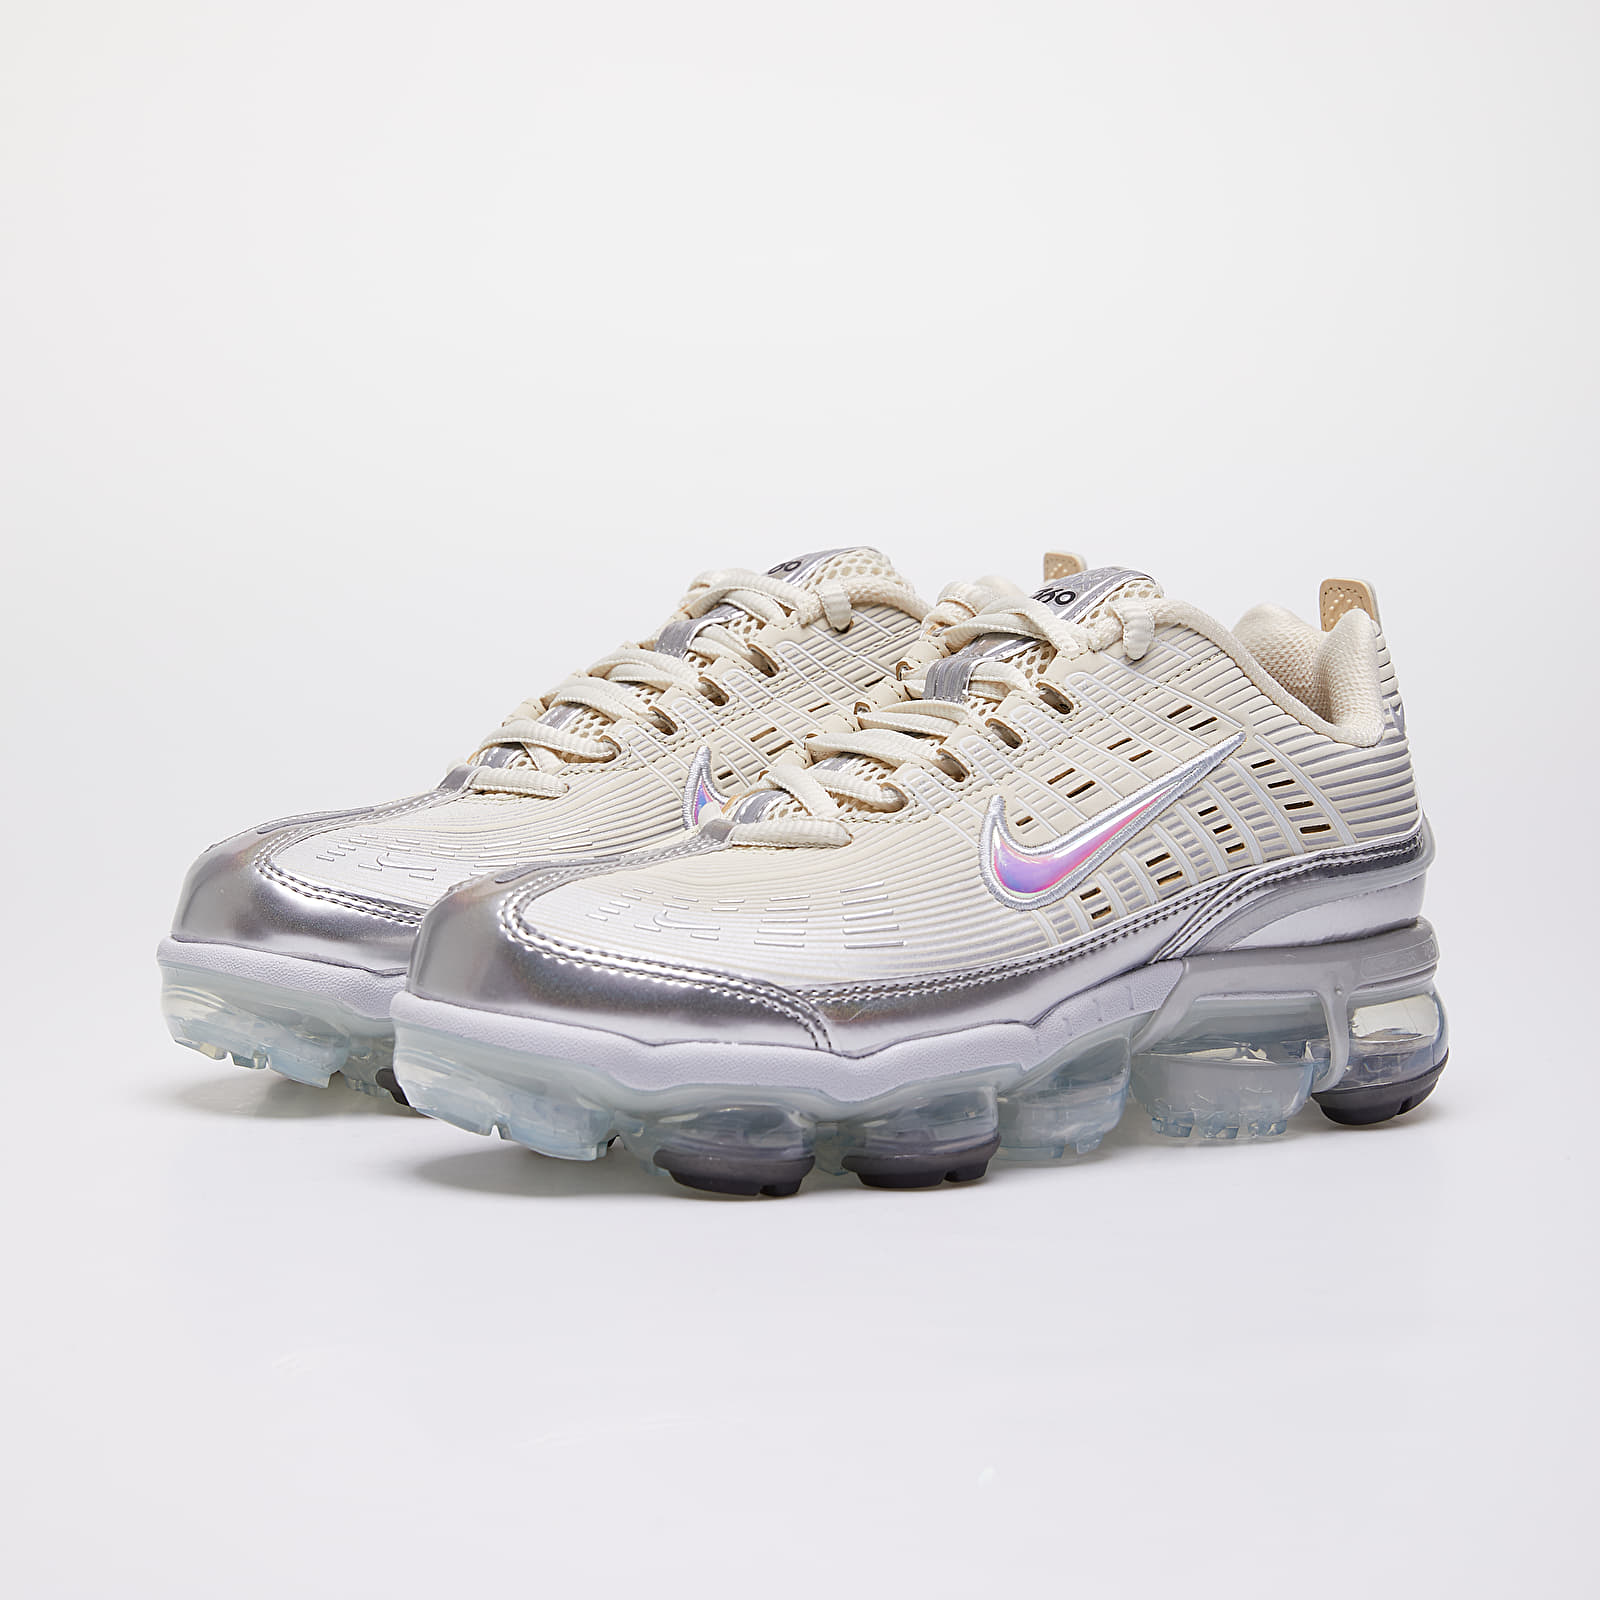 Nike W Air Vapormax 360 Fossil/ Metallic Silver-Black | Footshop